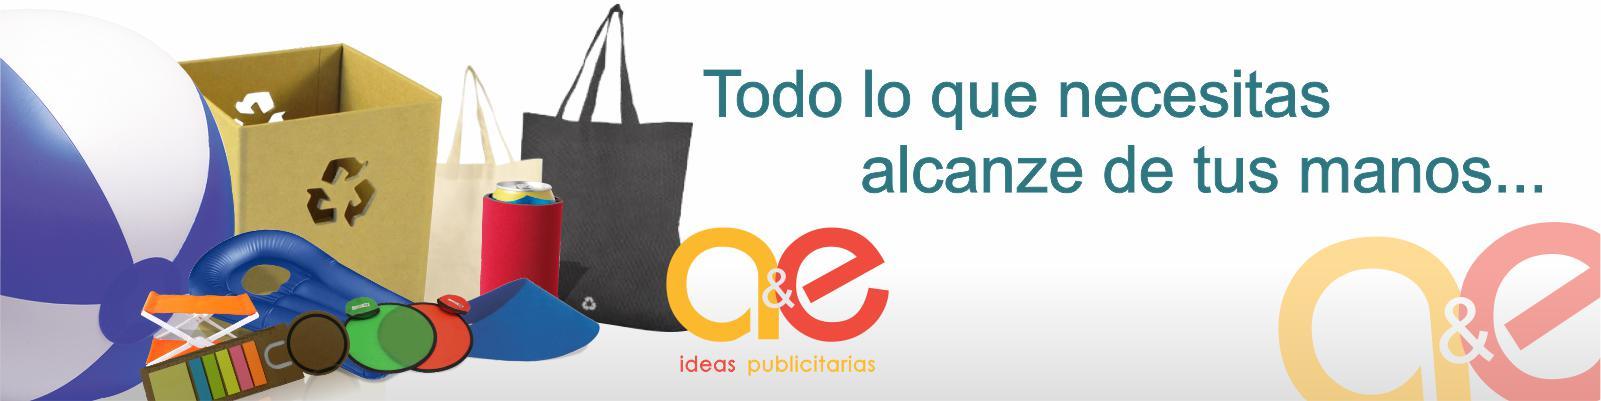 Banner ideas publicitarias 1